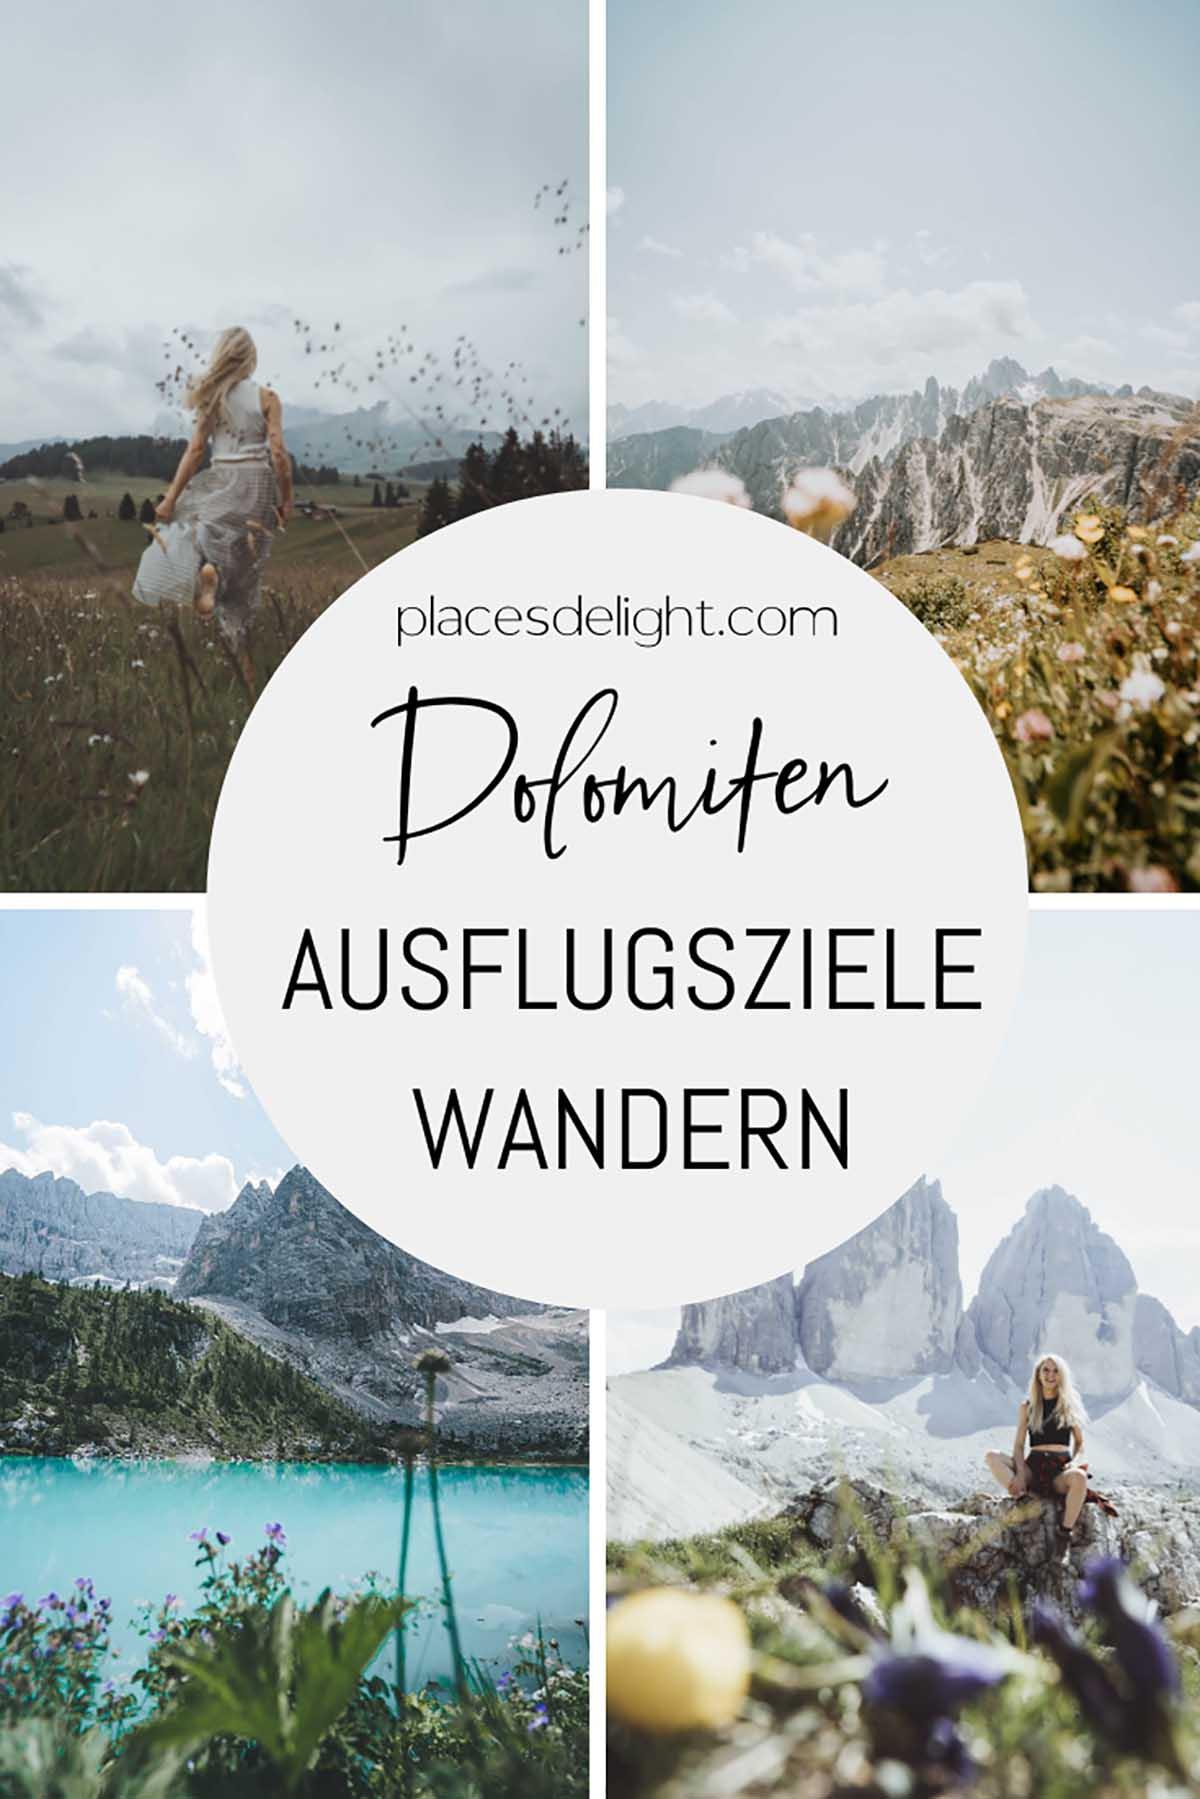 placesdelight-ausflugsziele-wandern-dolomiten-suedtirol